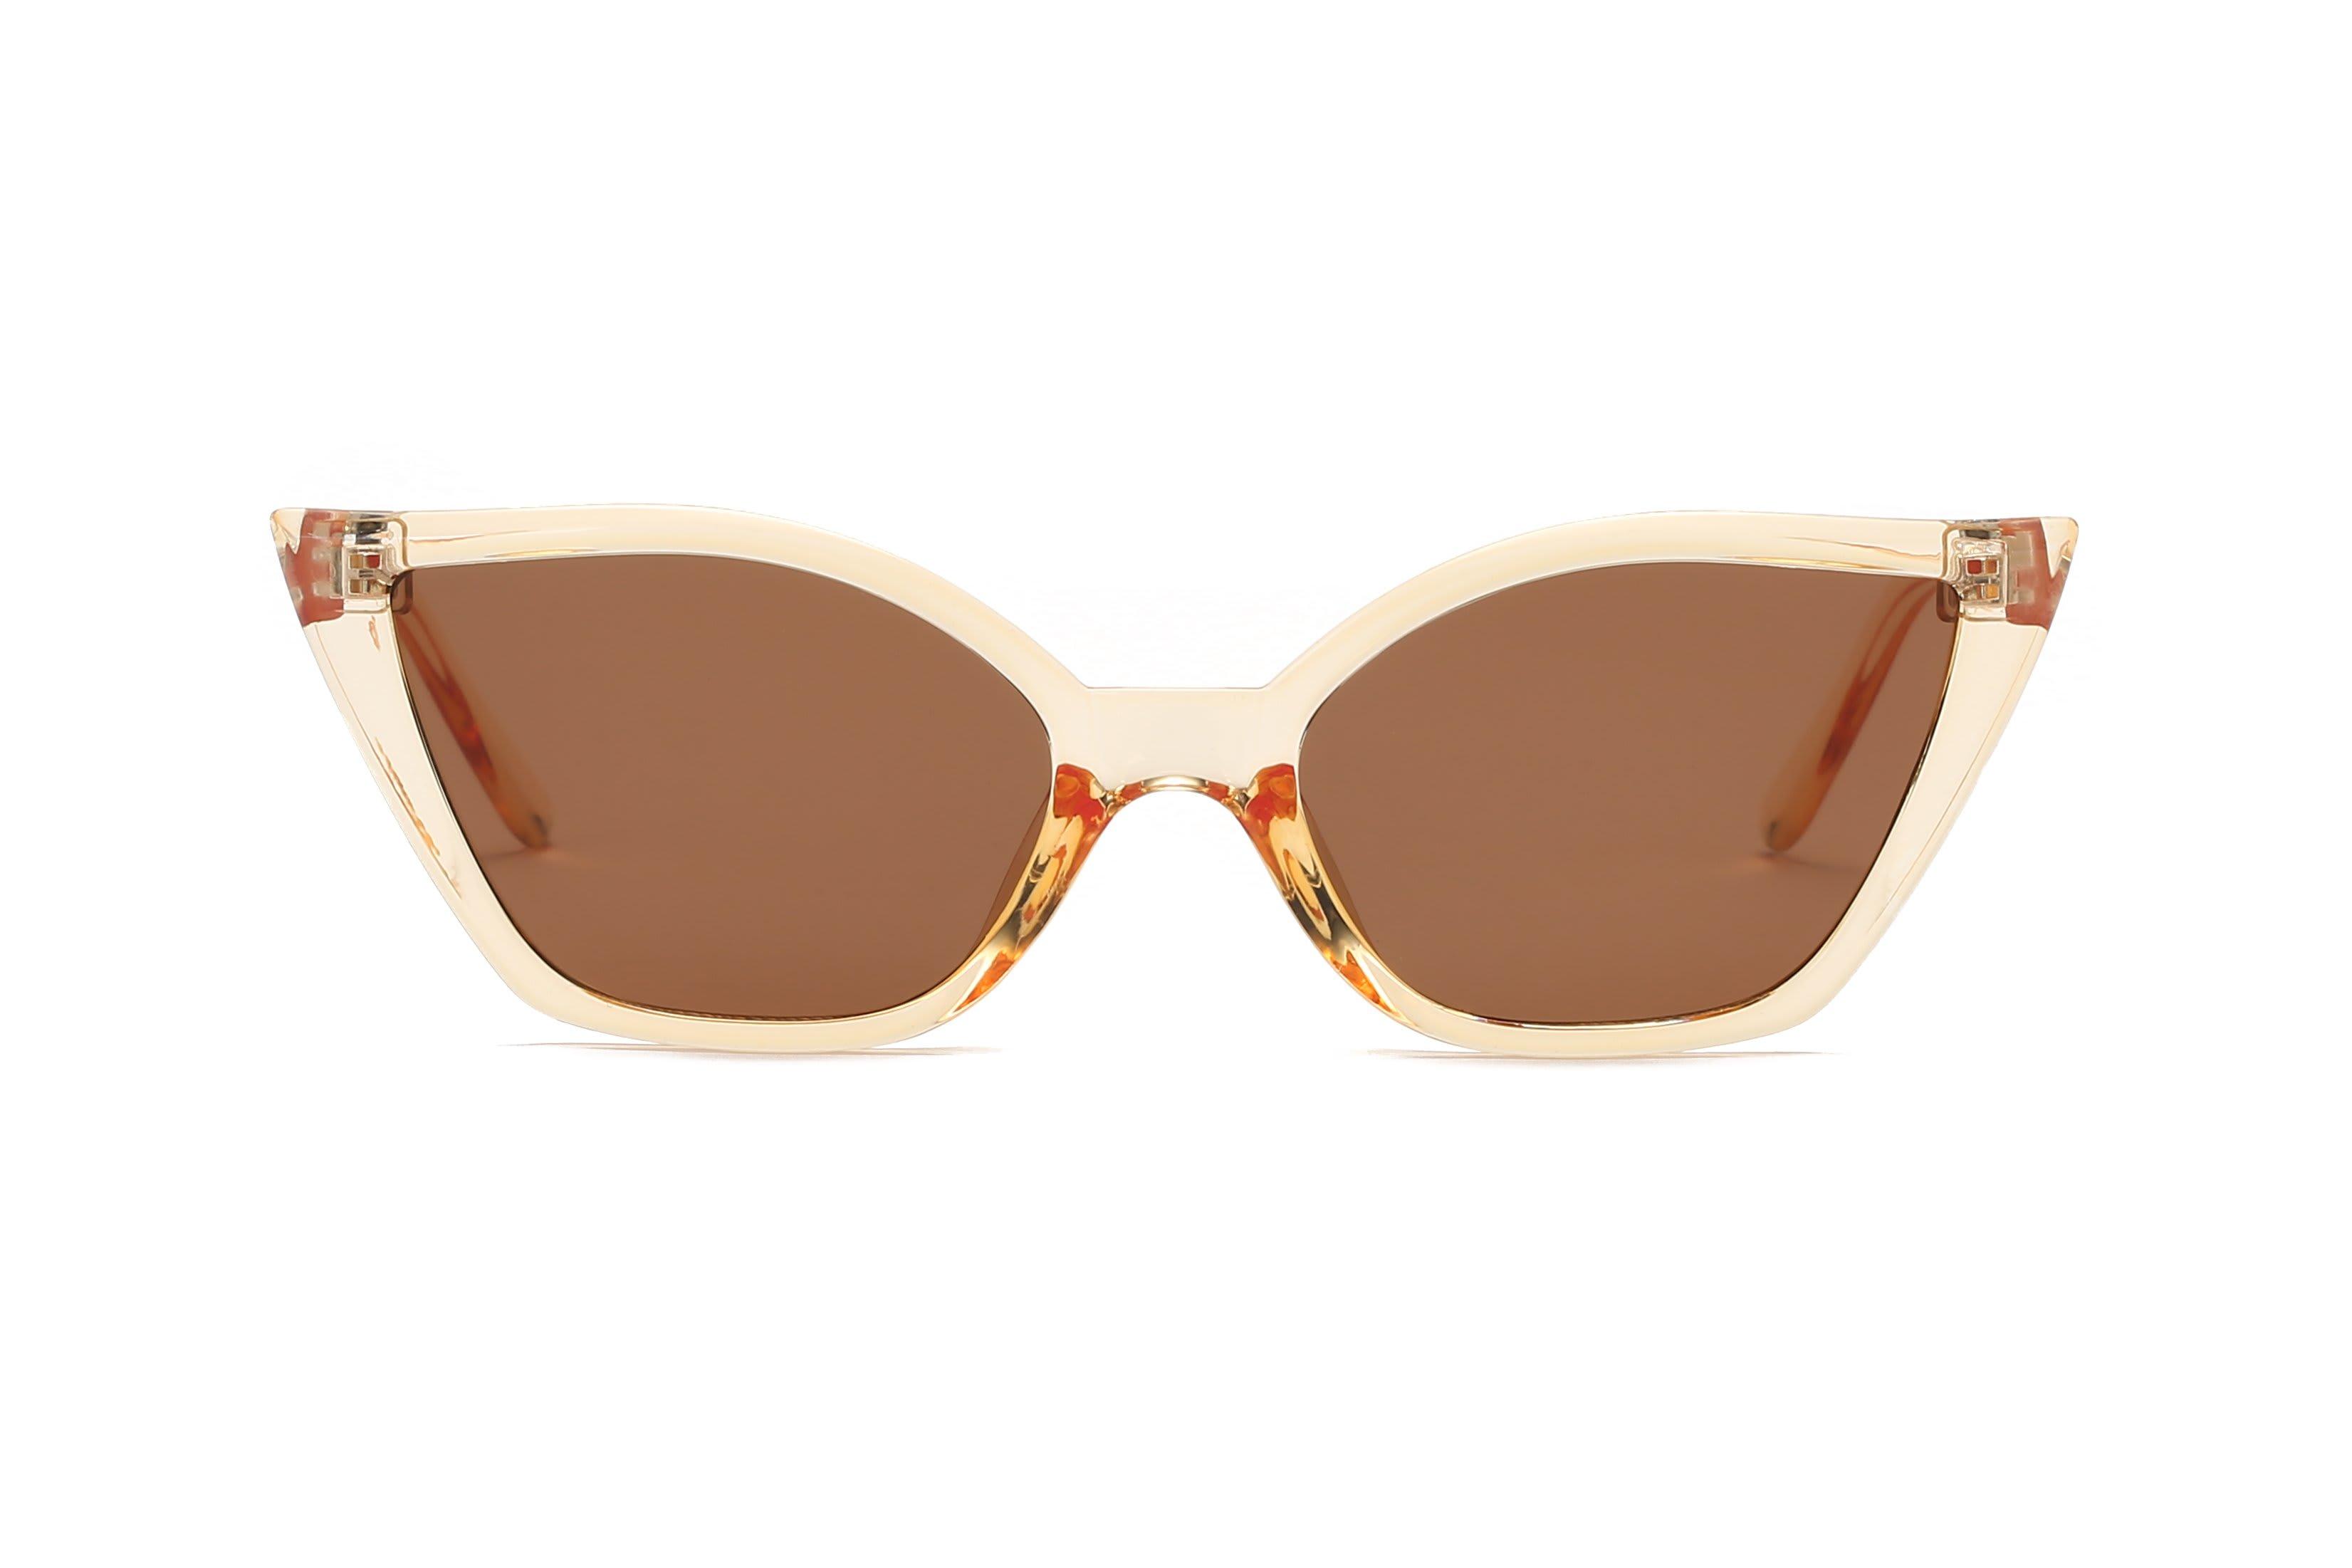 Retro Vintage Cat-eye sunglasses -  - Front